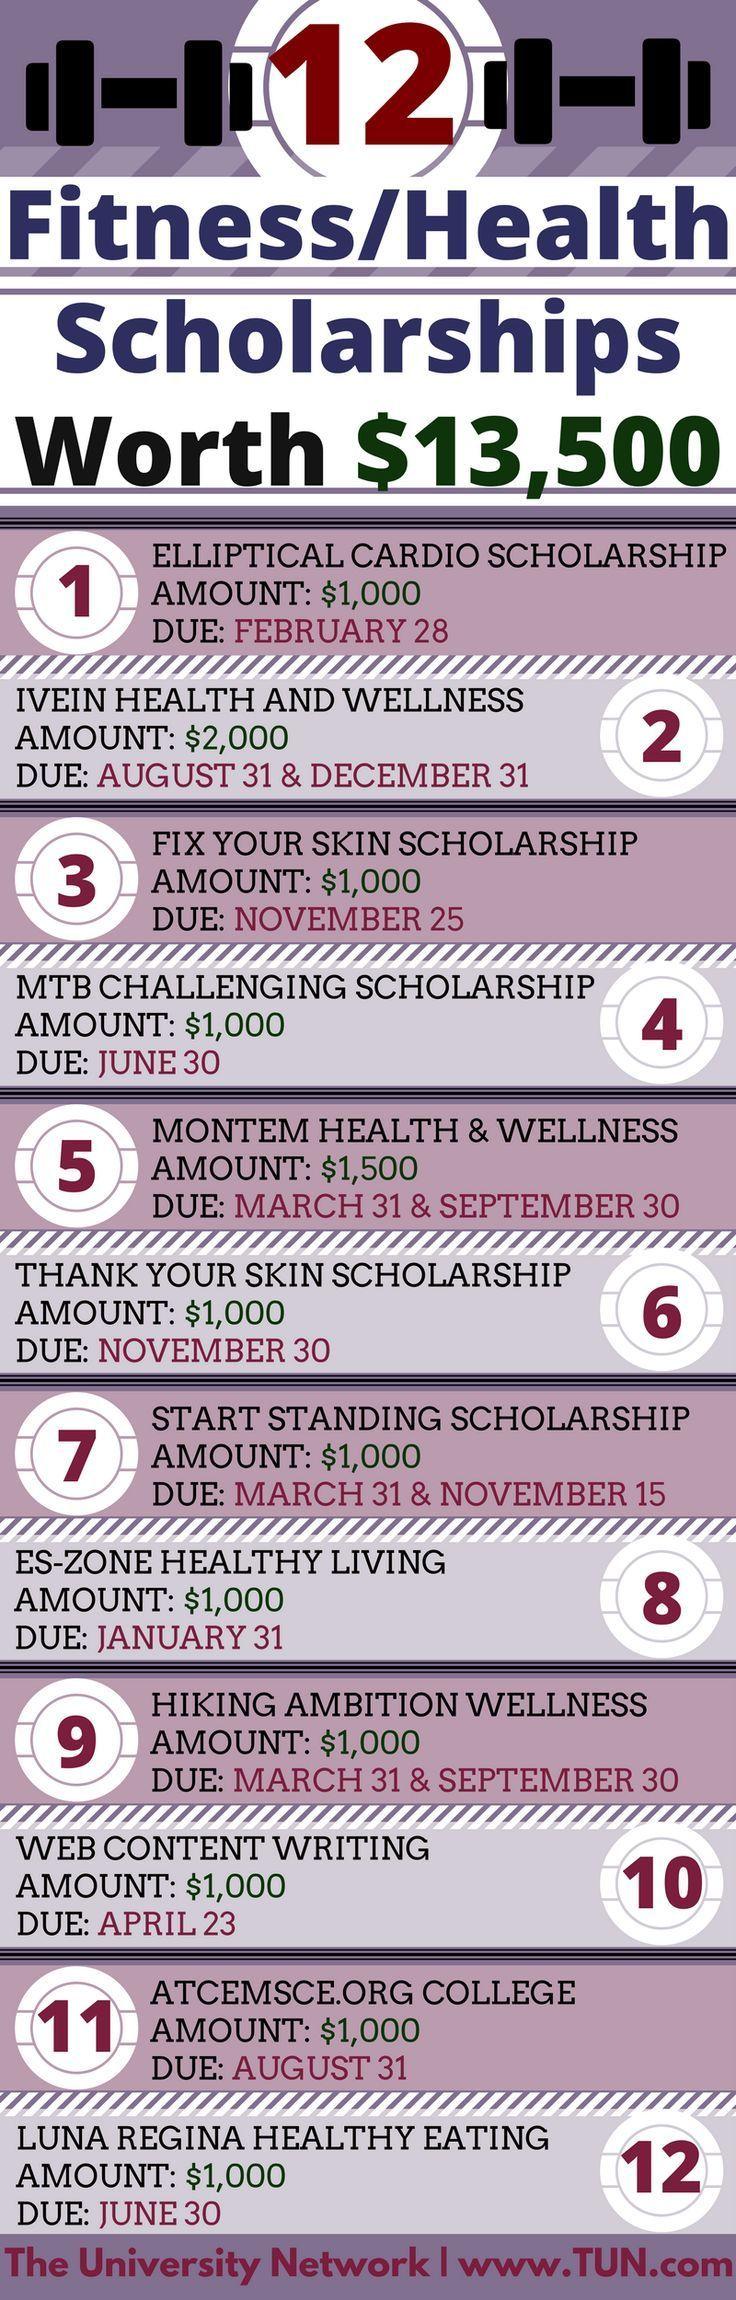 12 FitnessHealth Scholarships Worth 13500 378 best